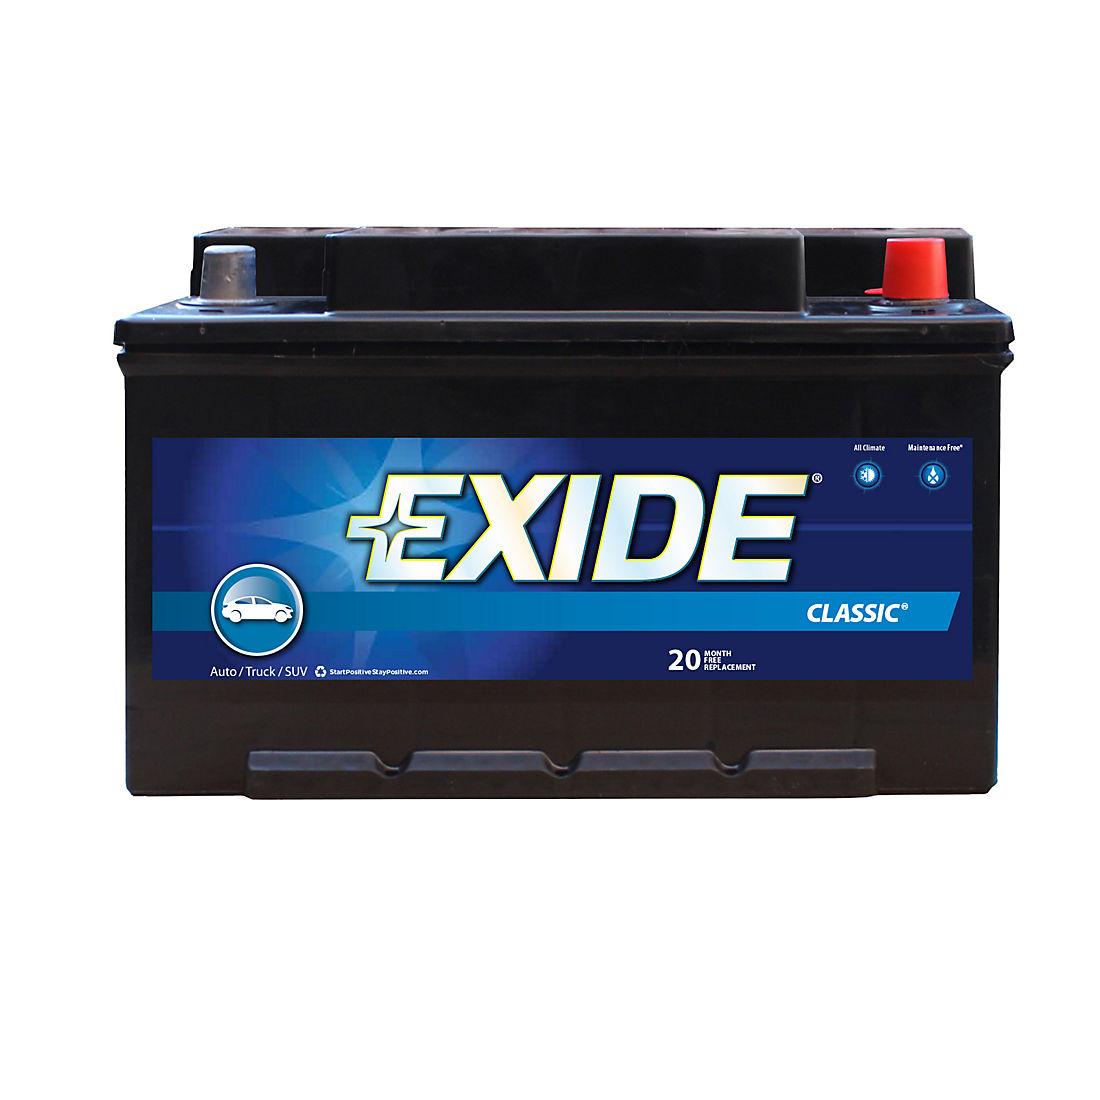 Exide Classic 40rc Auto Battery